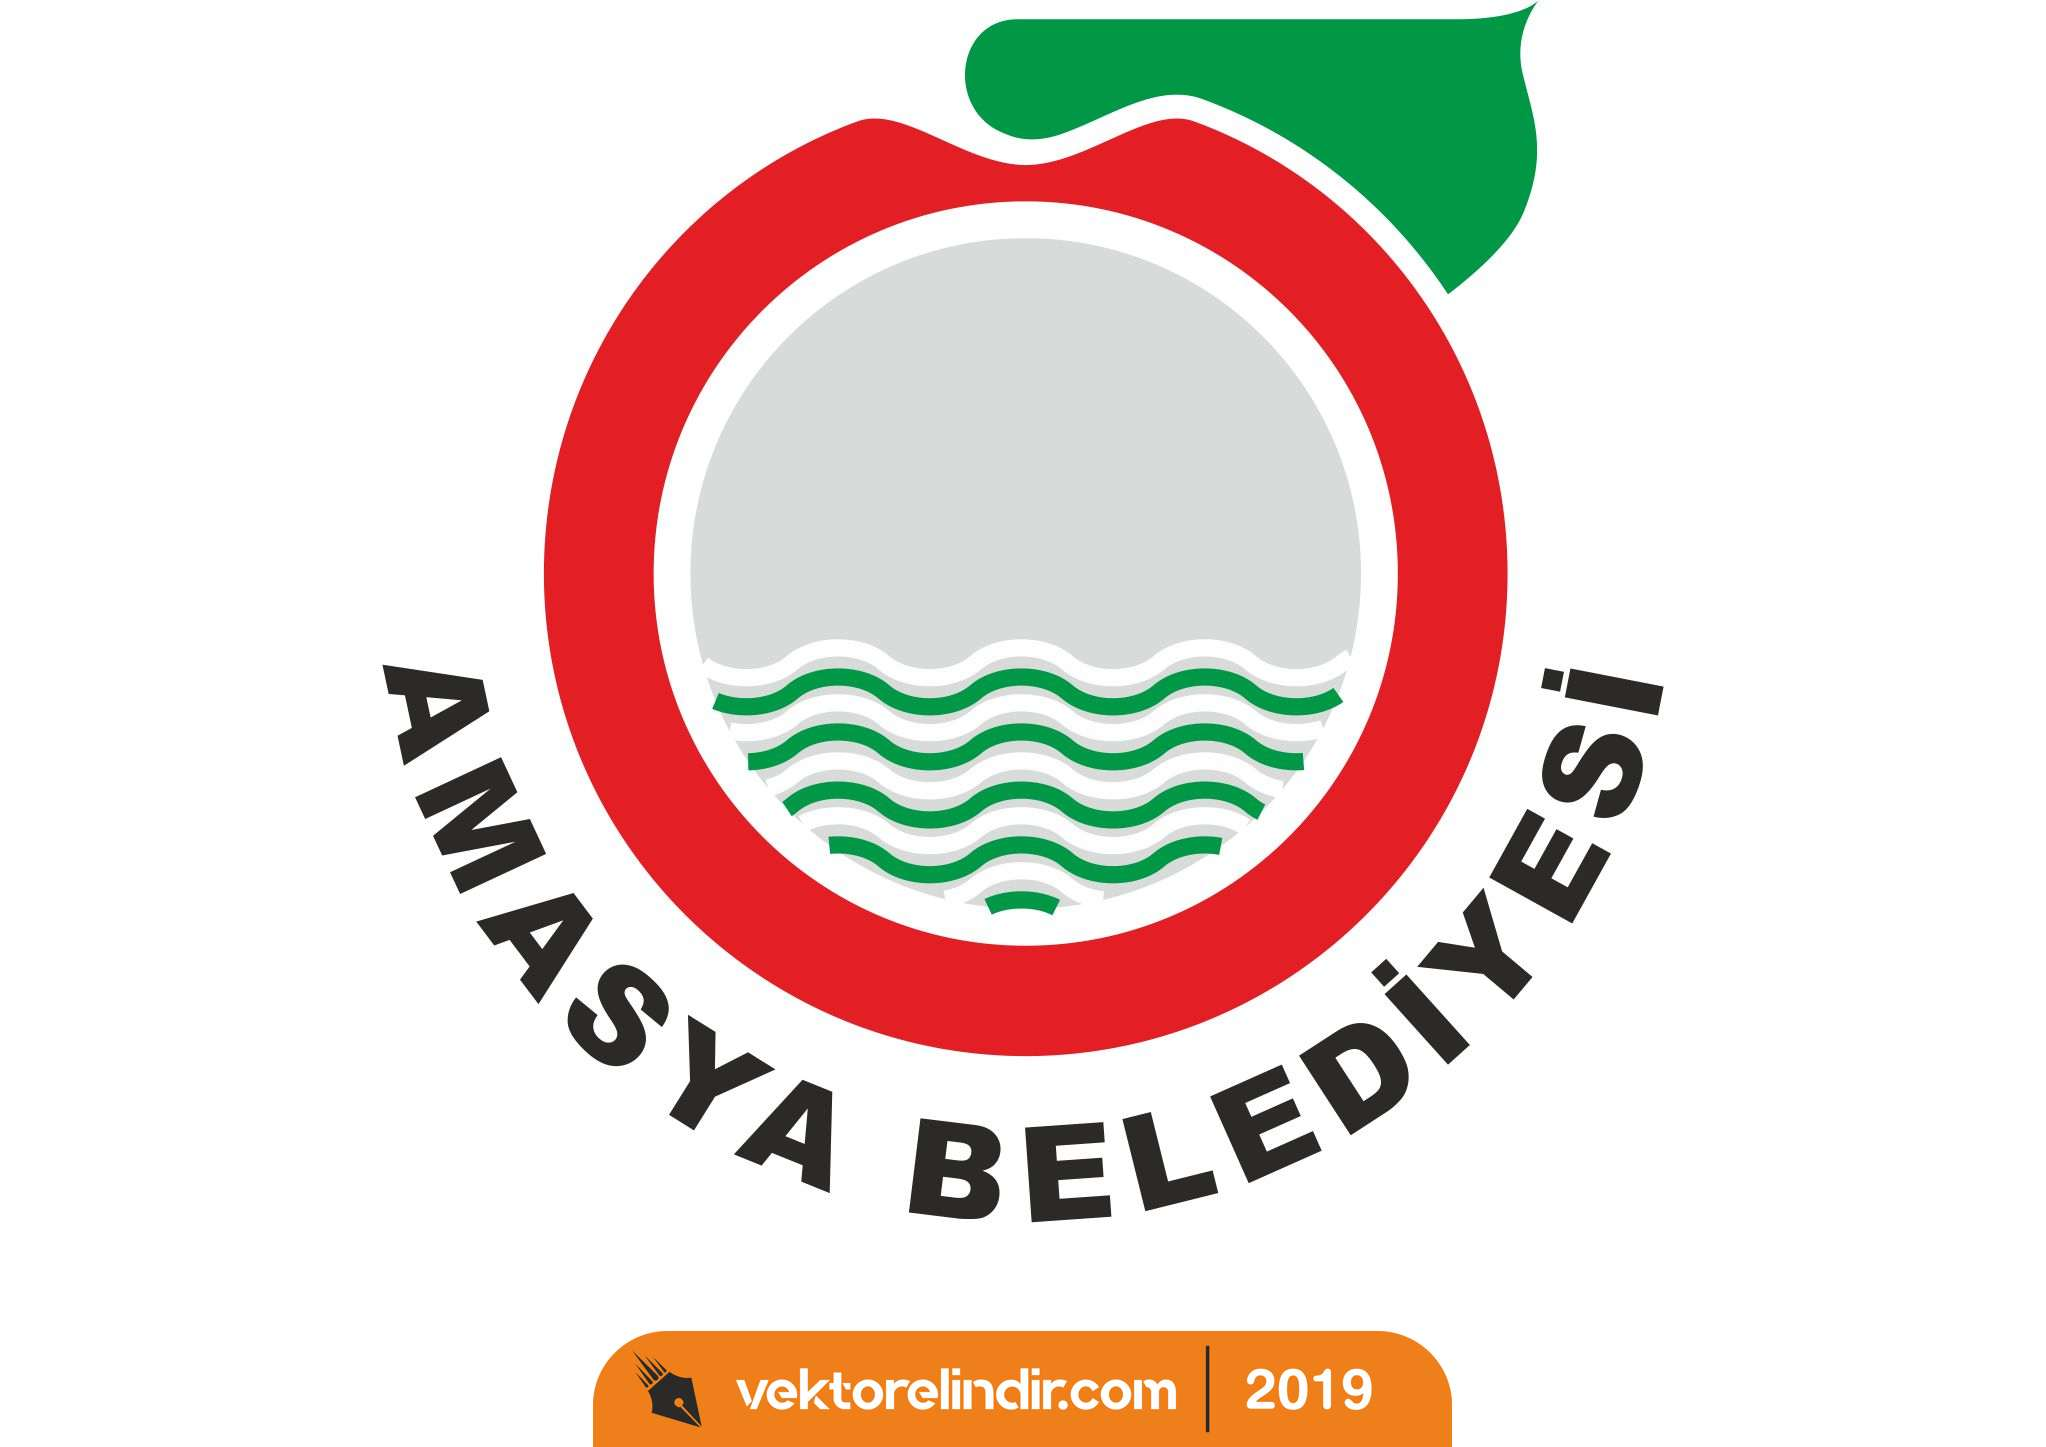 Amasya Belediyesi Logo, Amblem